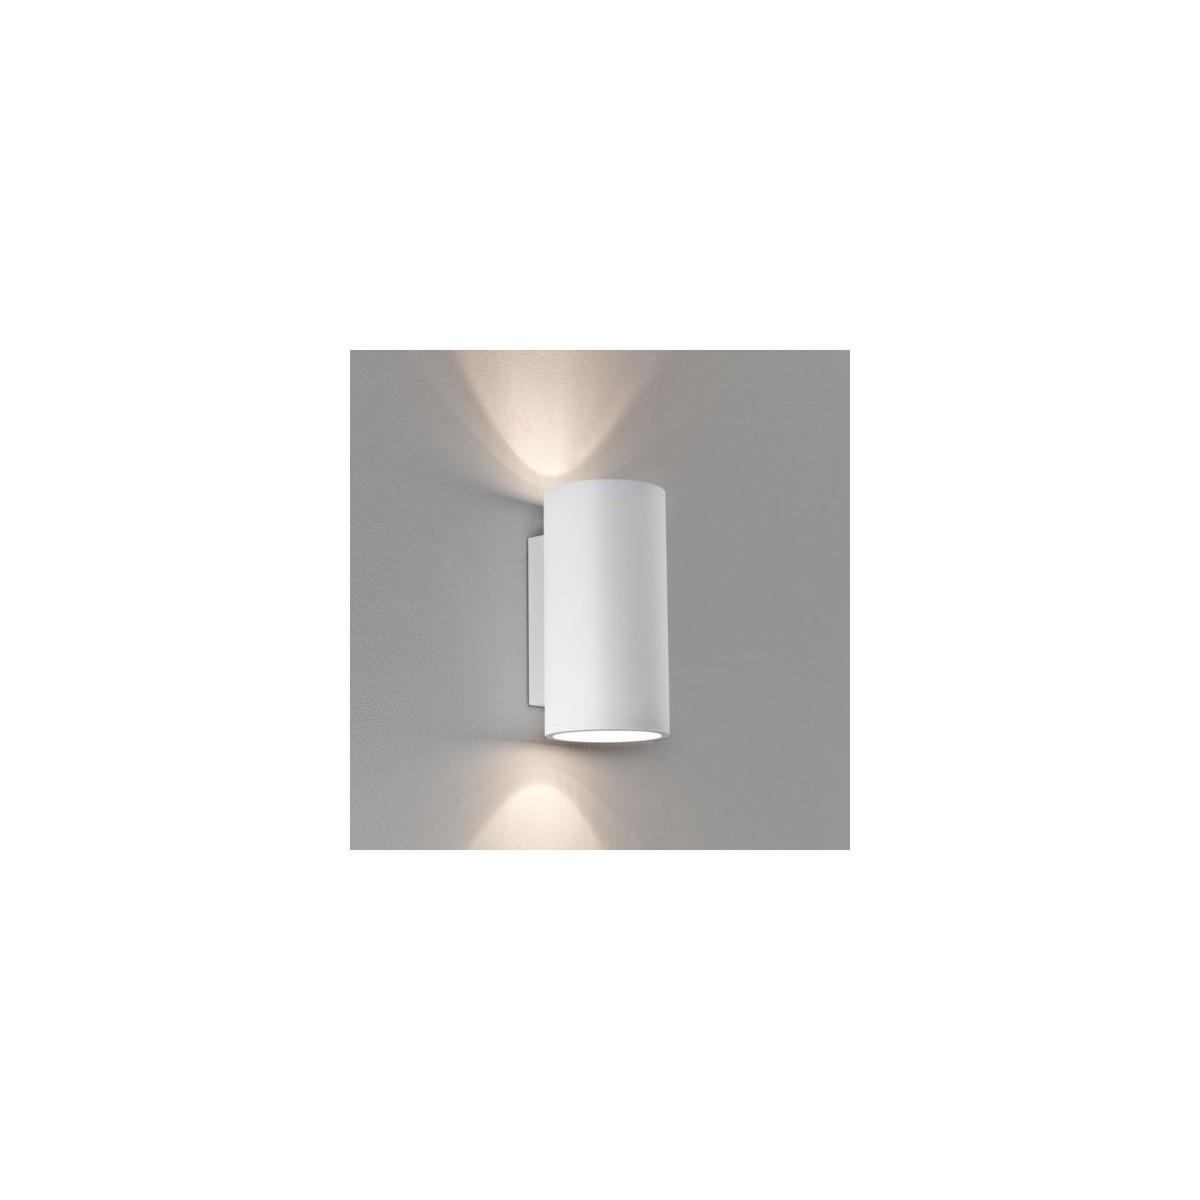 Astro Bologna 240 Ścienna 2x6W Max LED GU10 Gips 1287002